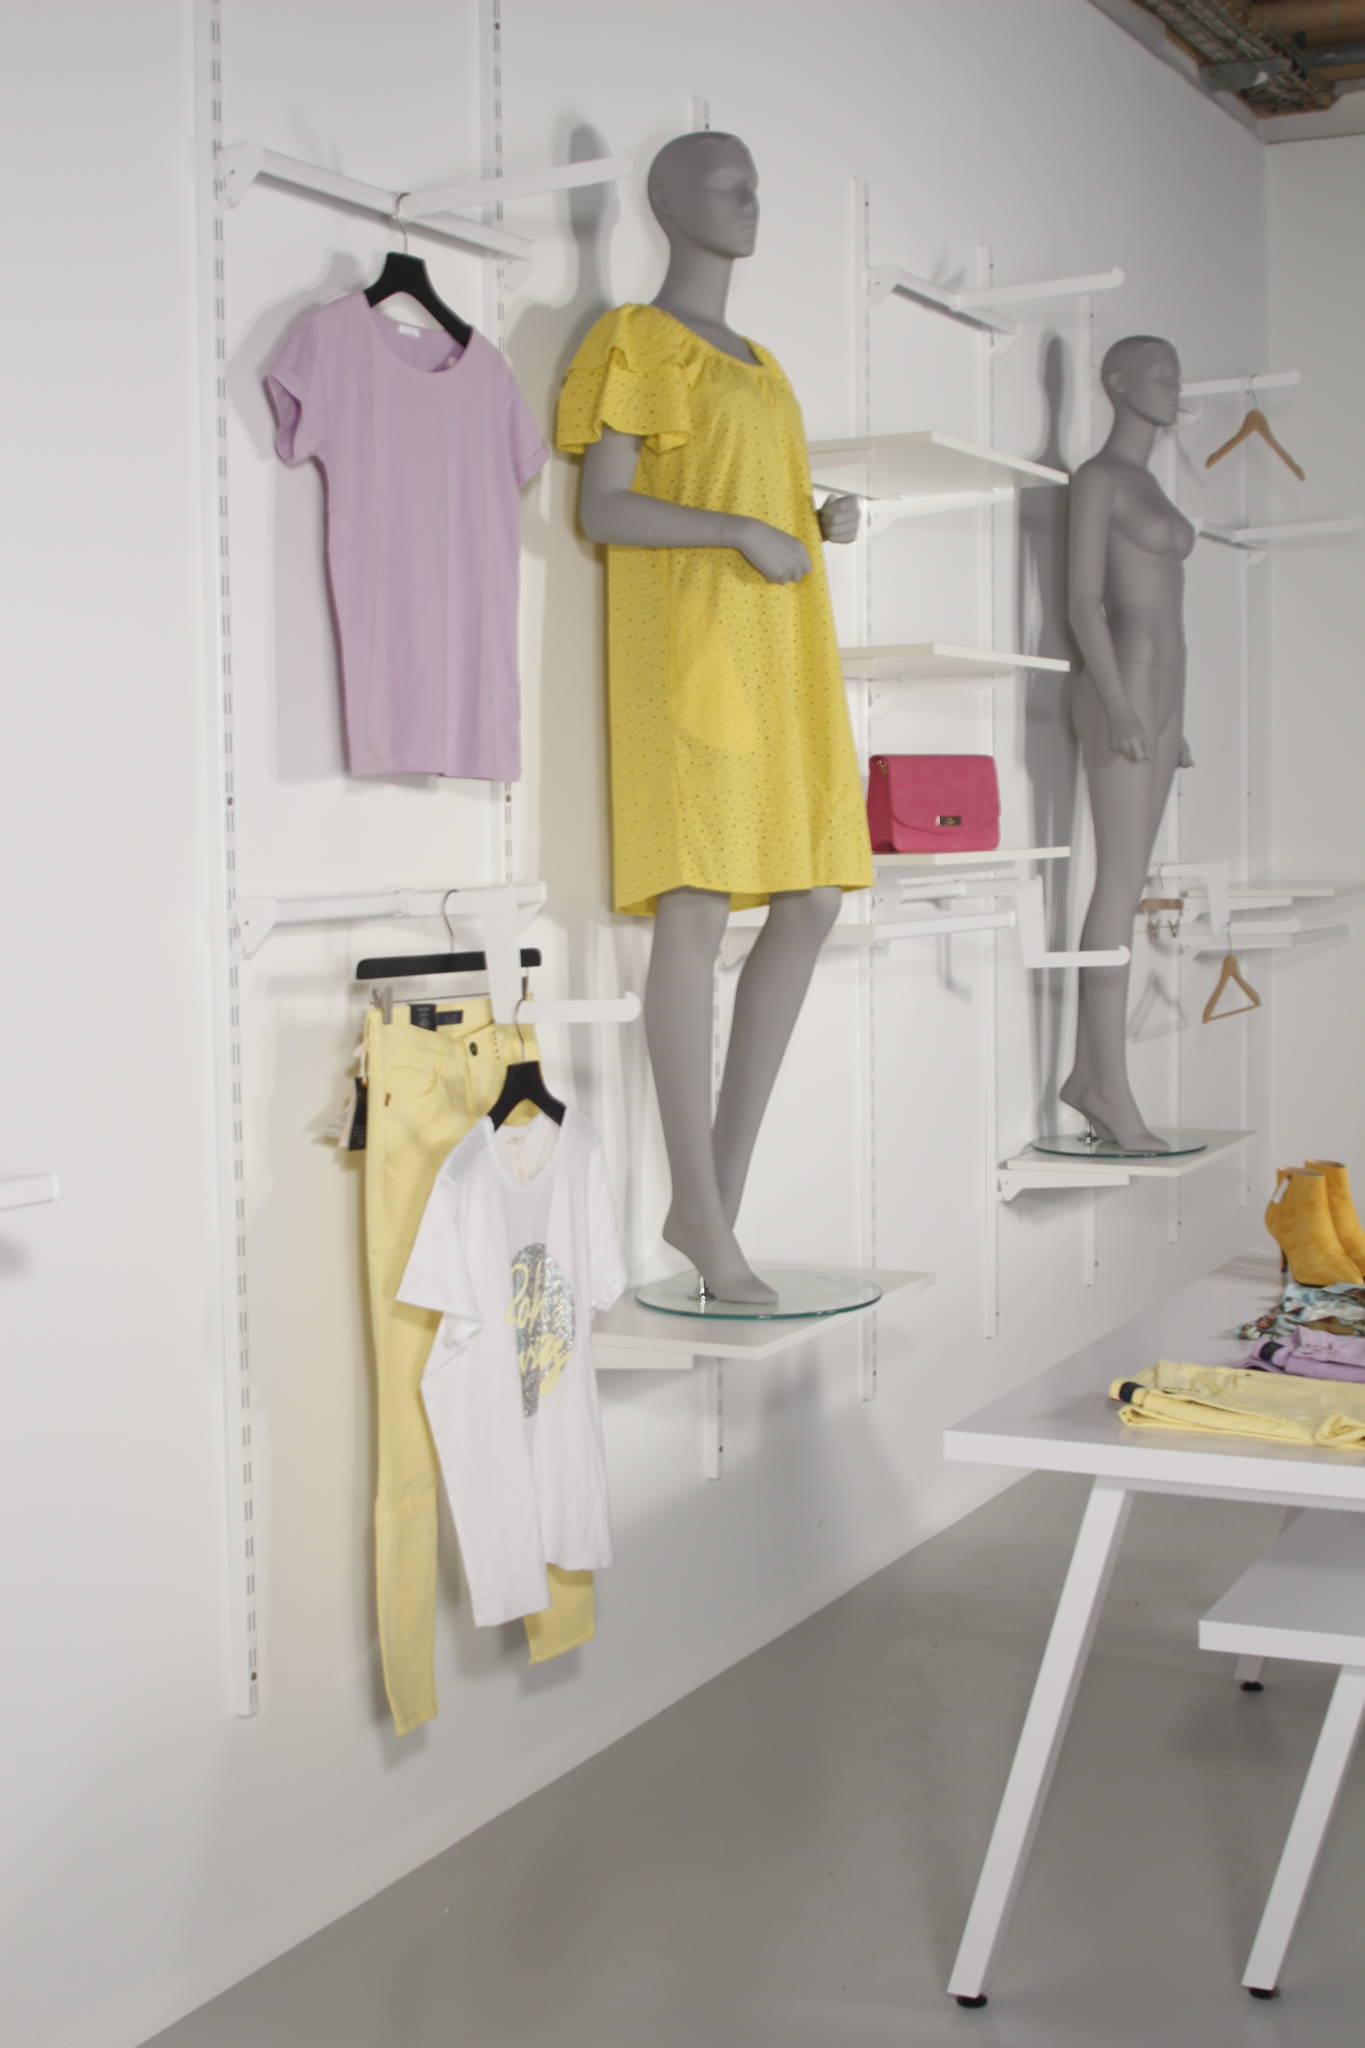 Hvidt butiksinventar og hvid butiksindretning.